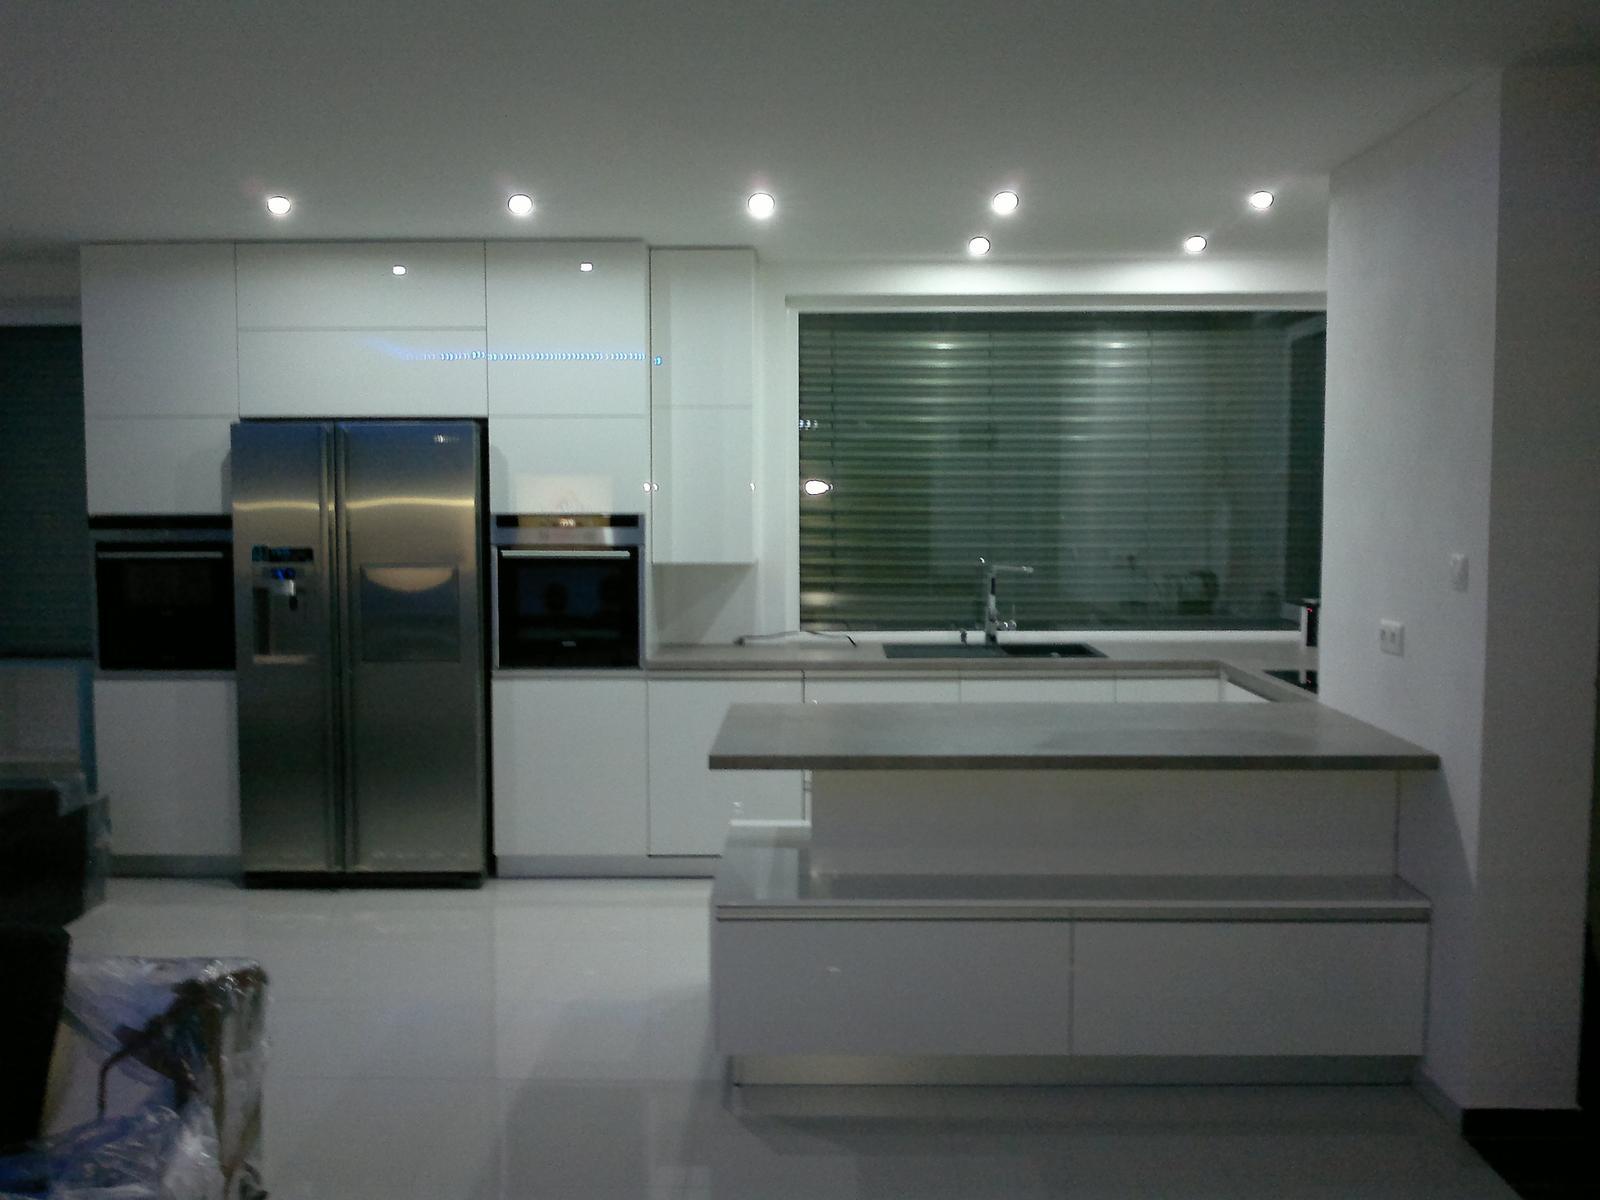 Nas domcek - Zatial dalsia nudna biela kuchyna.... ale pockajte co bude zajtra!